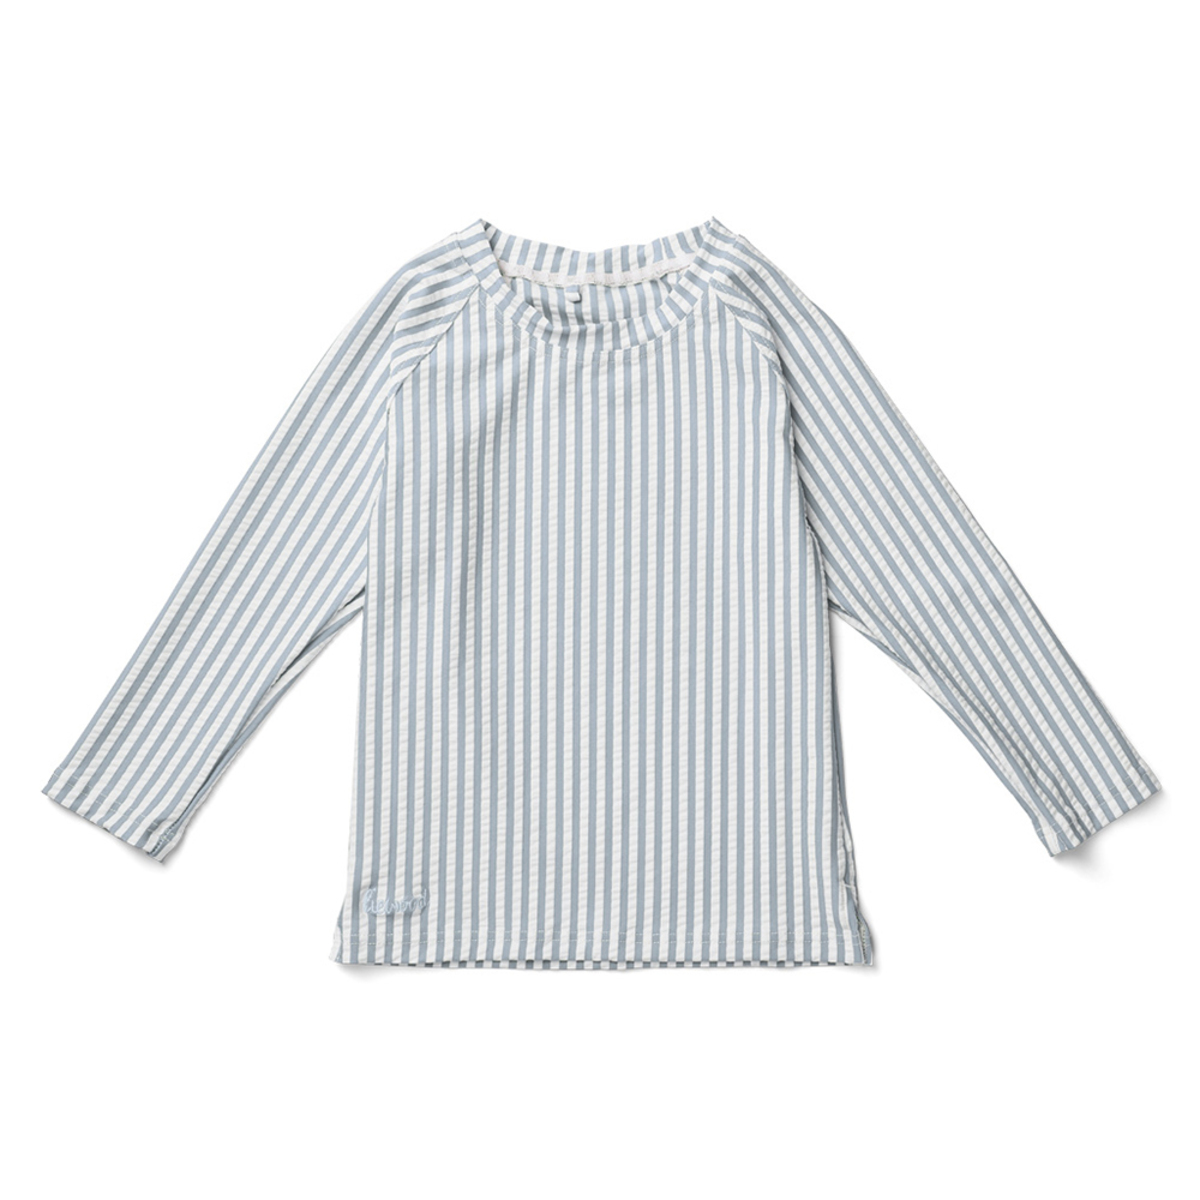 Accessoires bébé Tee-Shirt Noah Rayé Bleu et Blanc - 9/18 Mois Tee-Shirt Noah Rayé Bleu et Blanc - 9/18 Mois